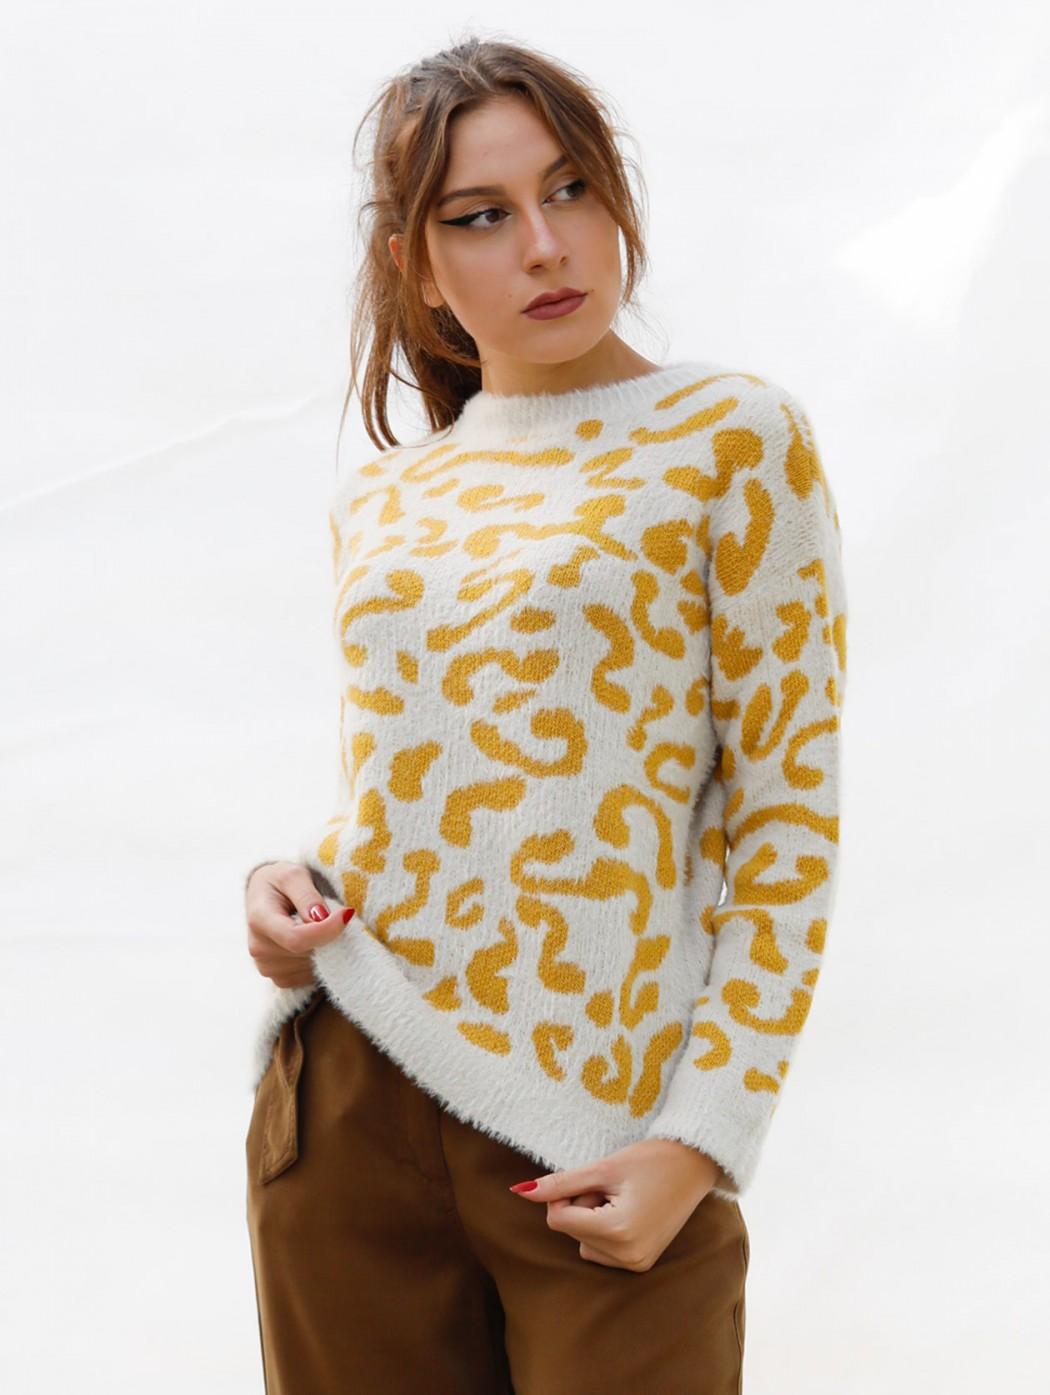 Paz Torras white and yellow...